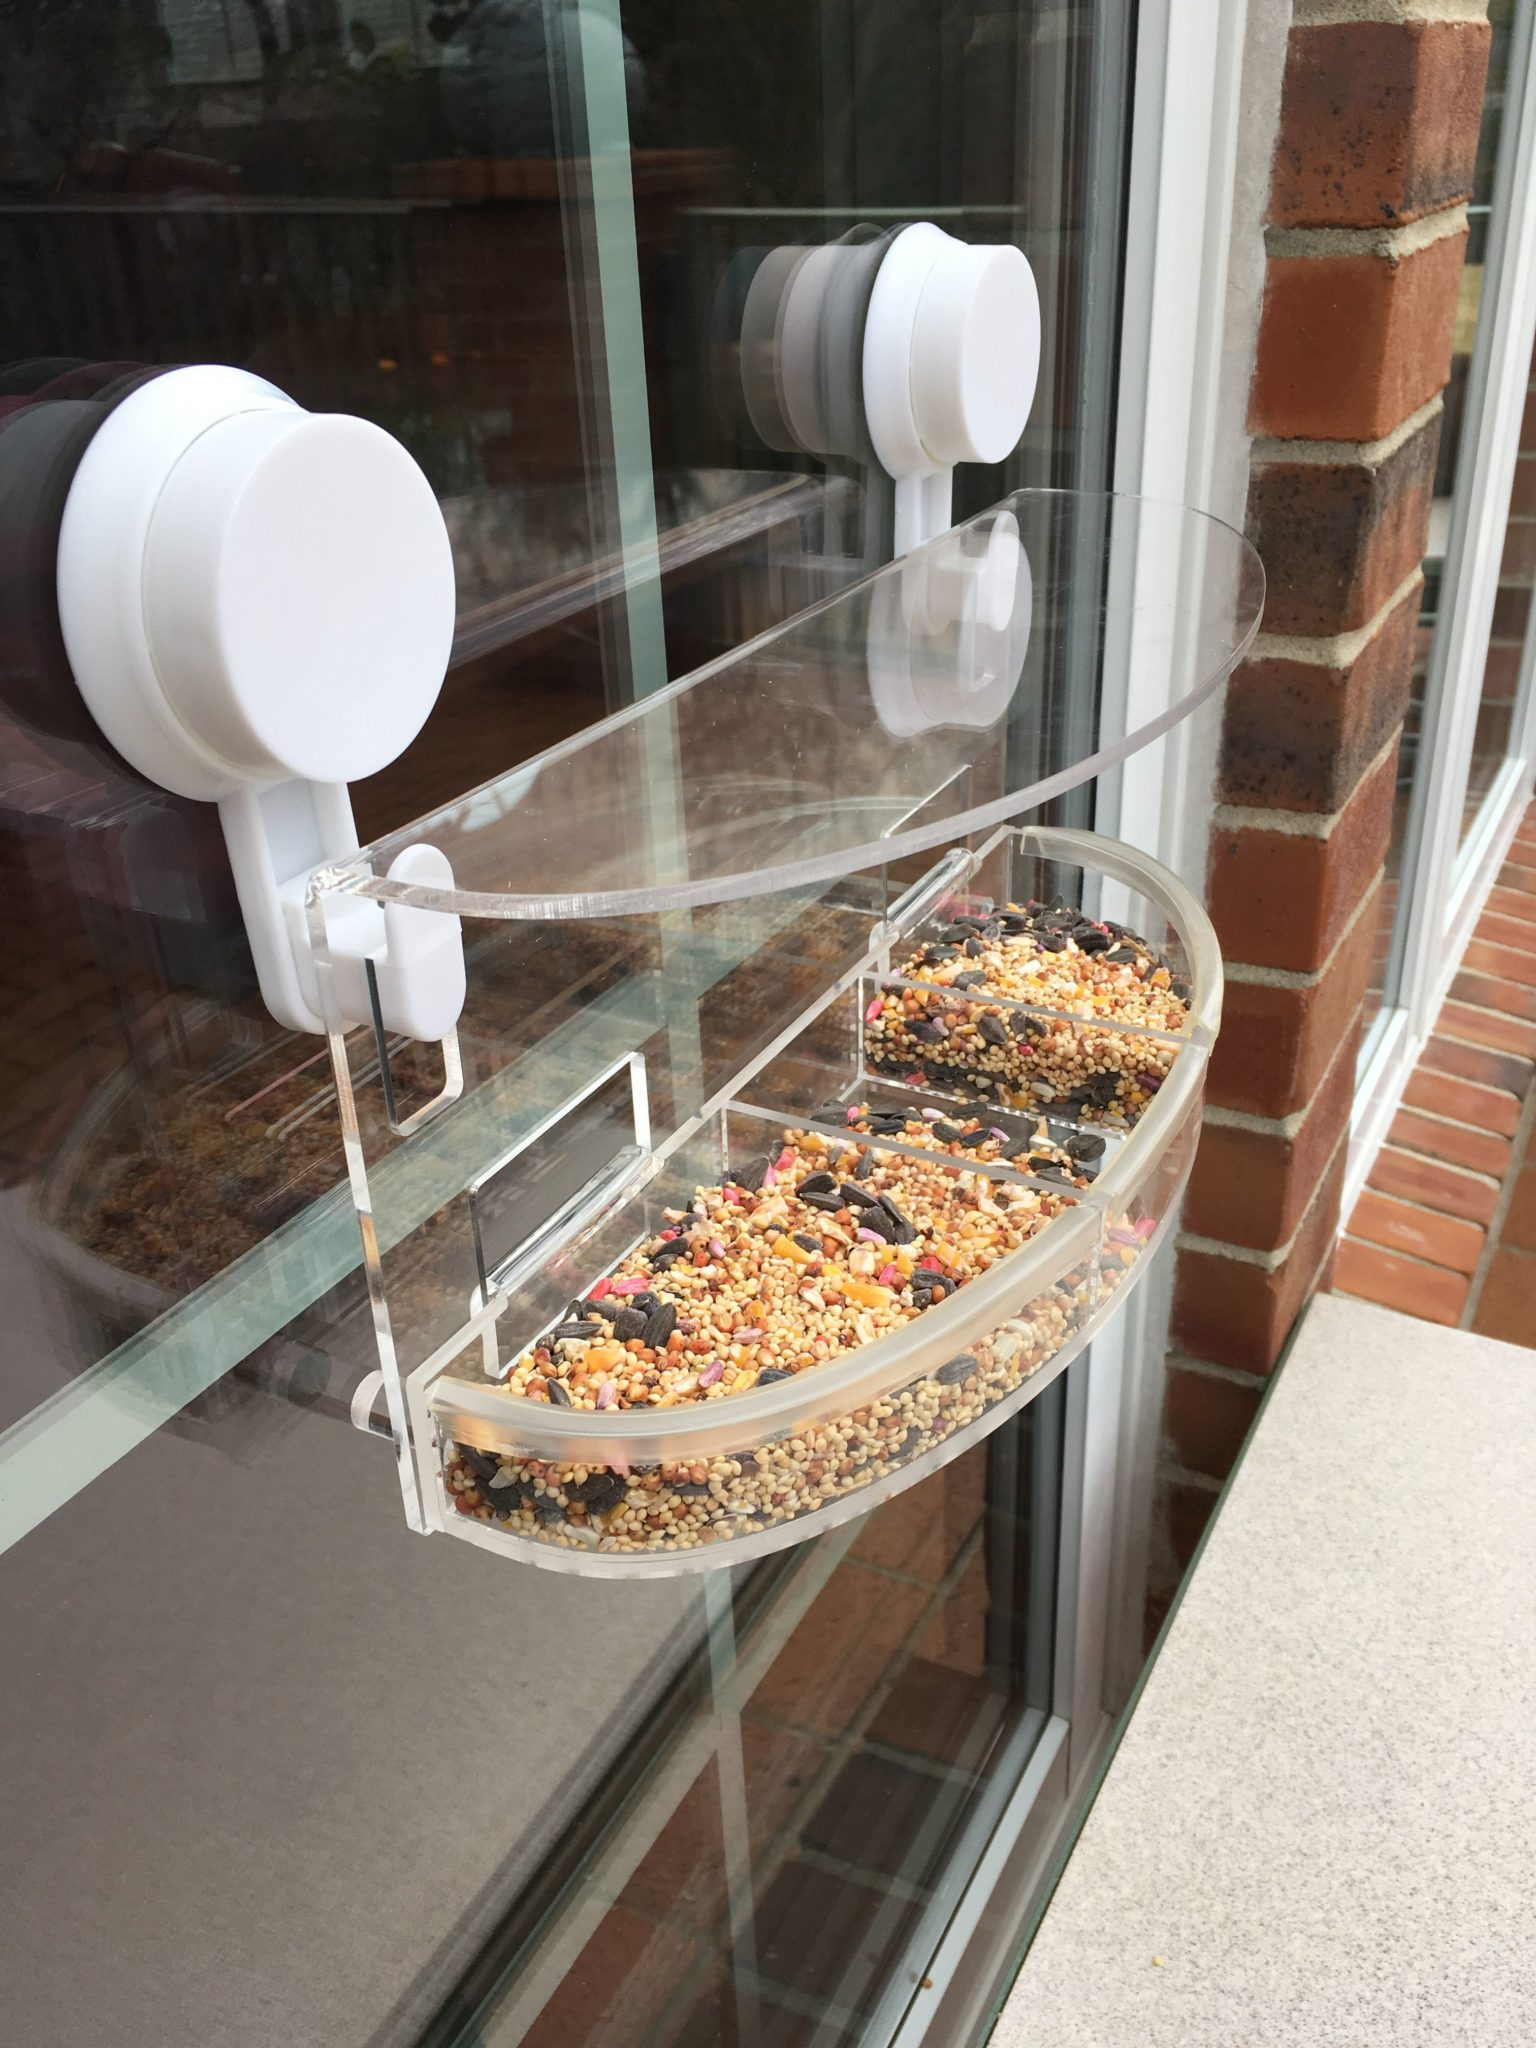 Window Bird Feeder WooPet Wild Bird Feeder Product Arrival and Installation Video - Floppycats IMG_3837